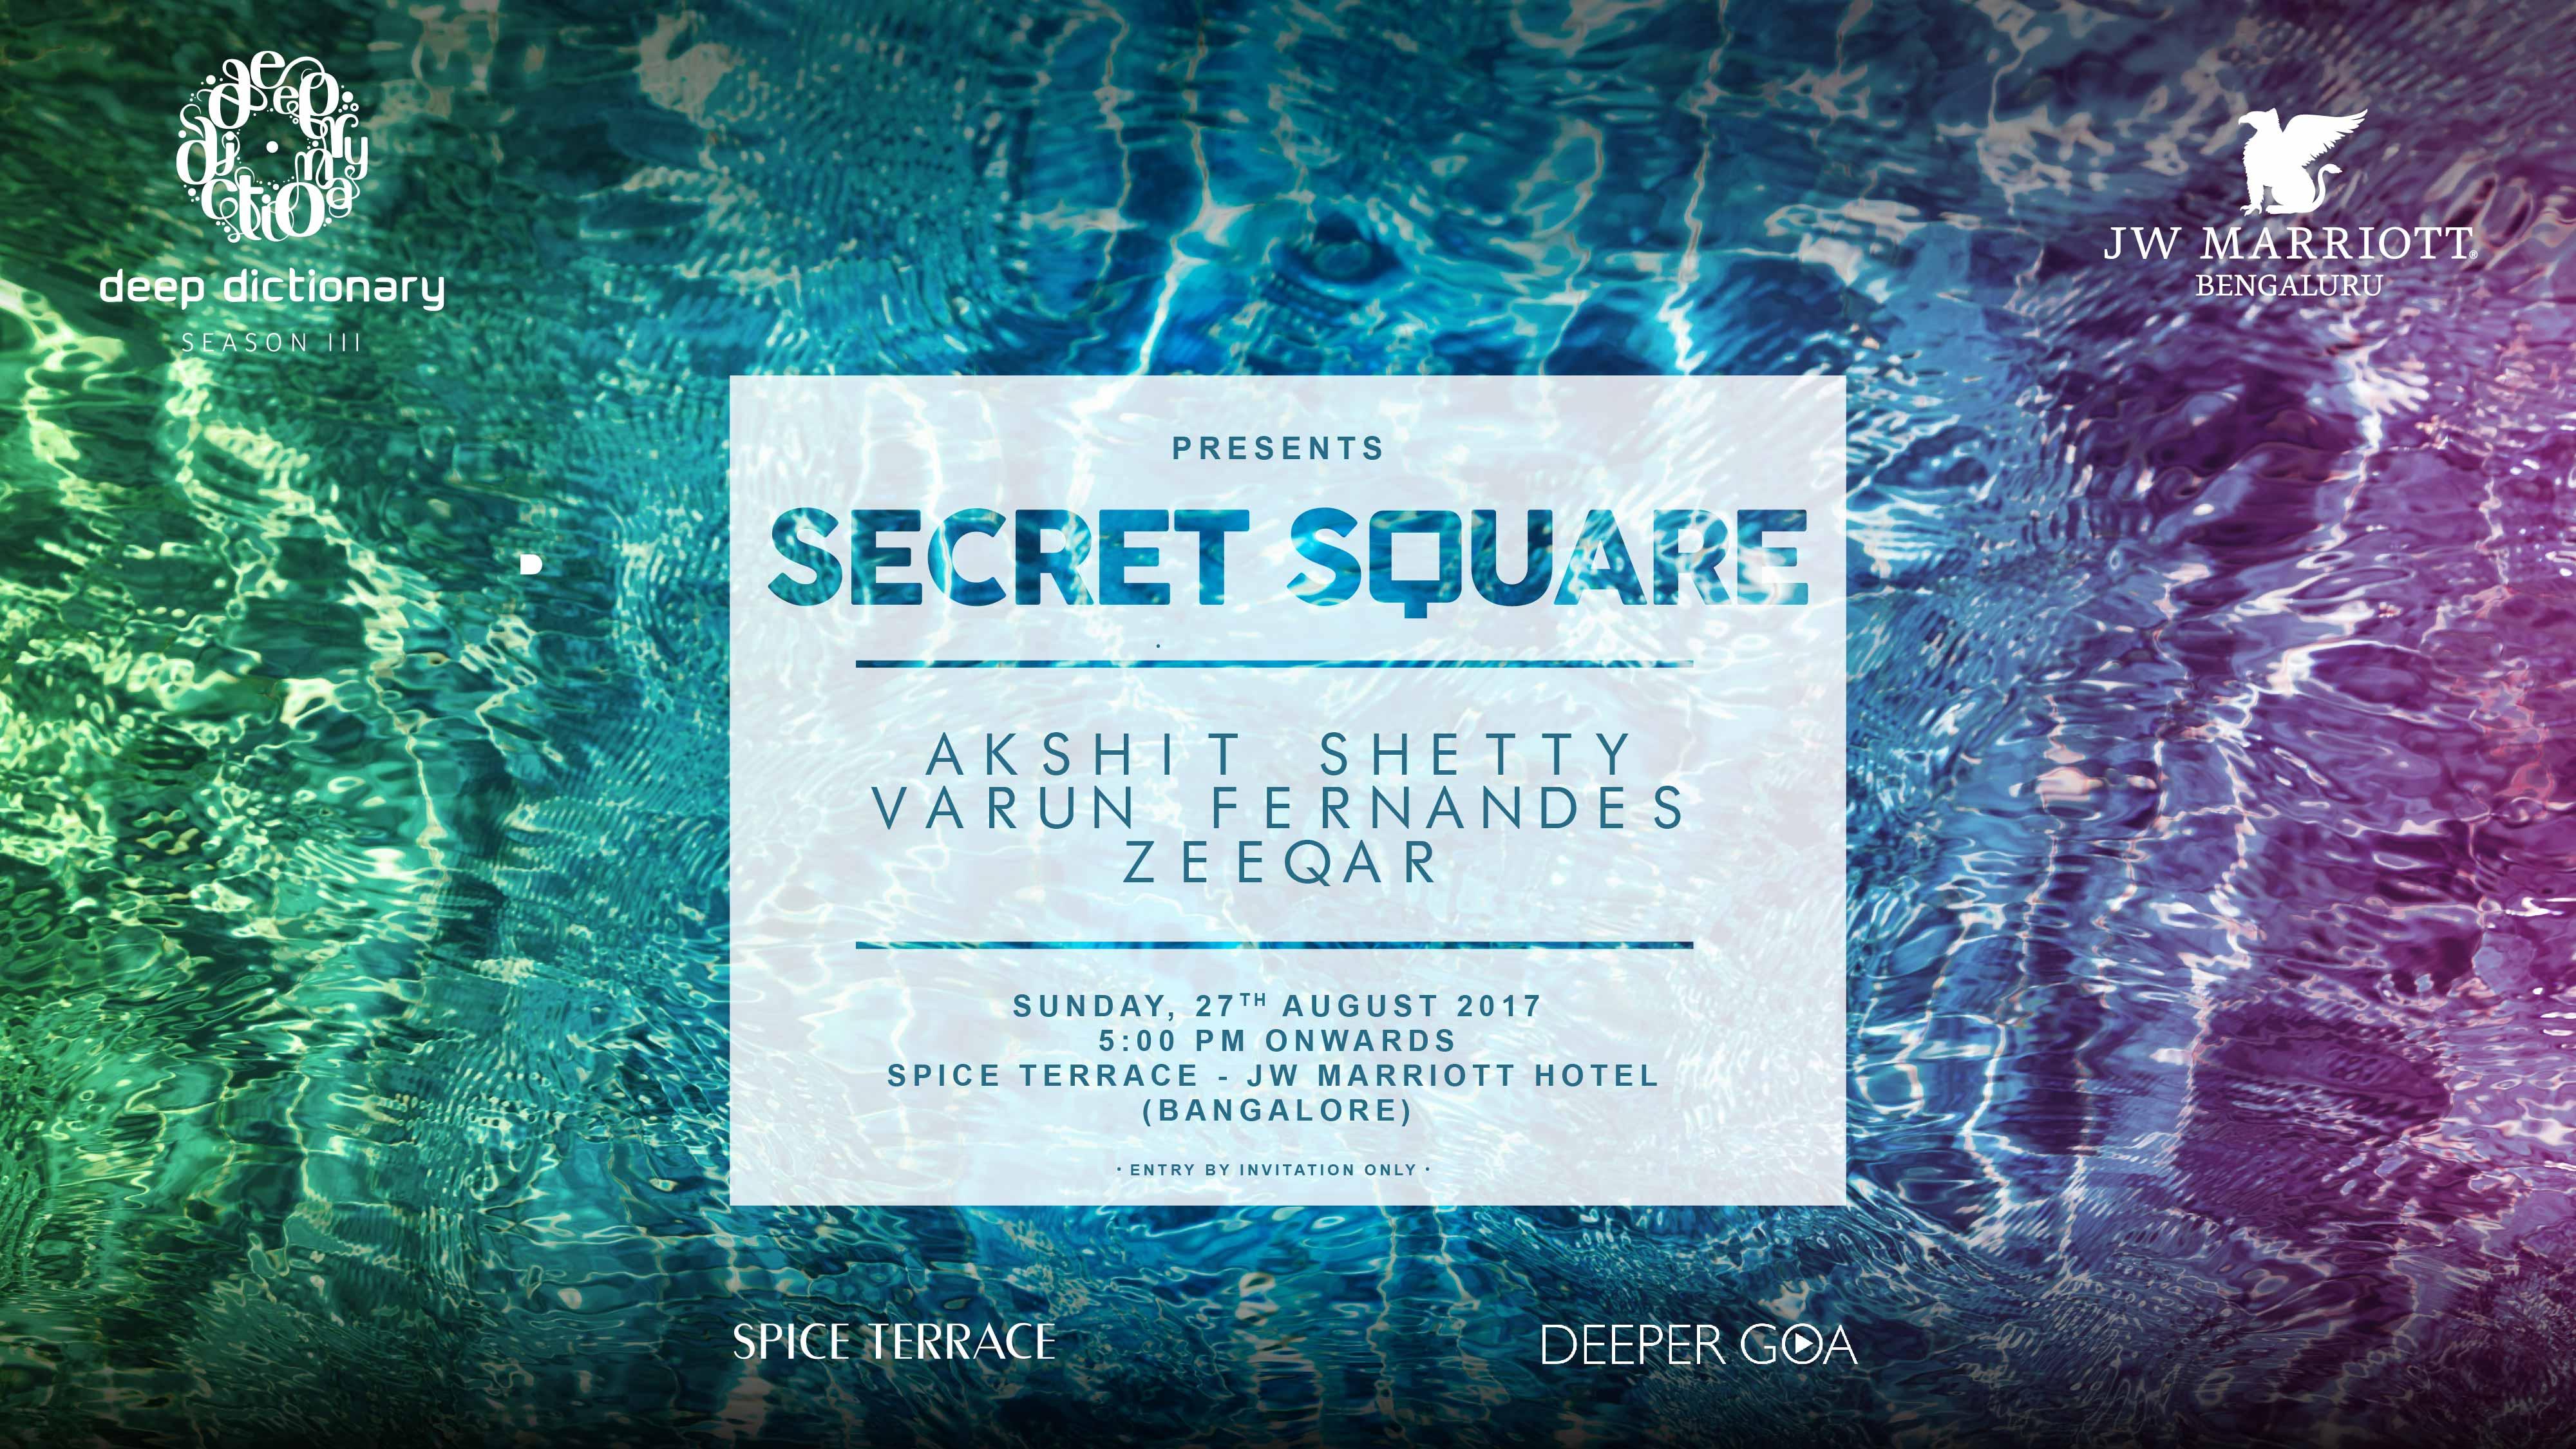 Deep Dictionary Presents Secret Square Spice Terrace Deep Dictionary